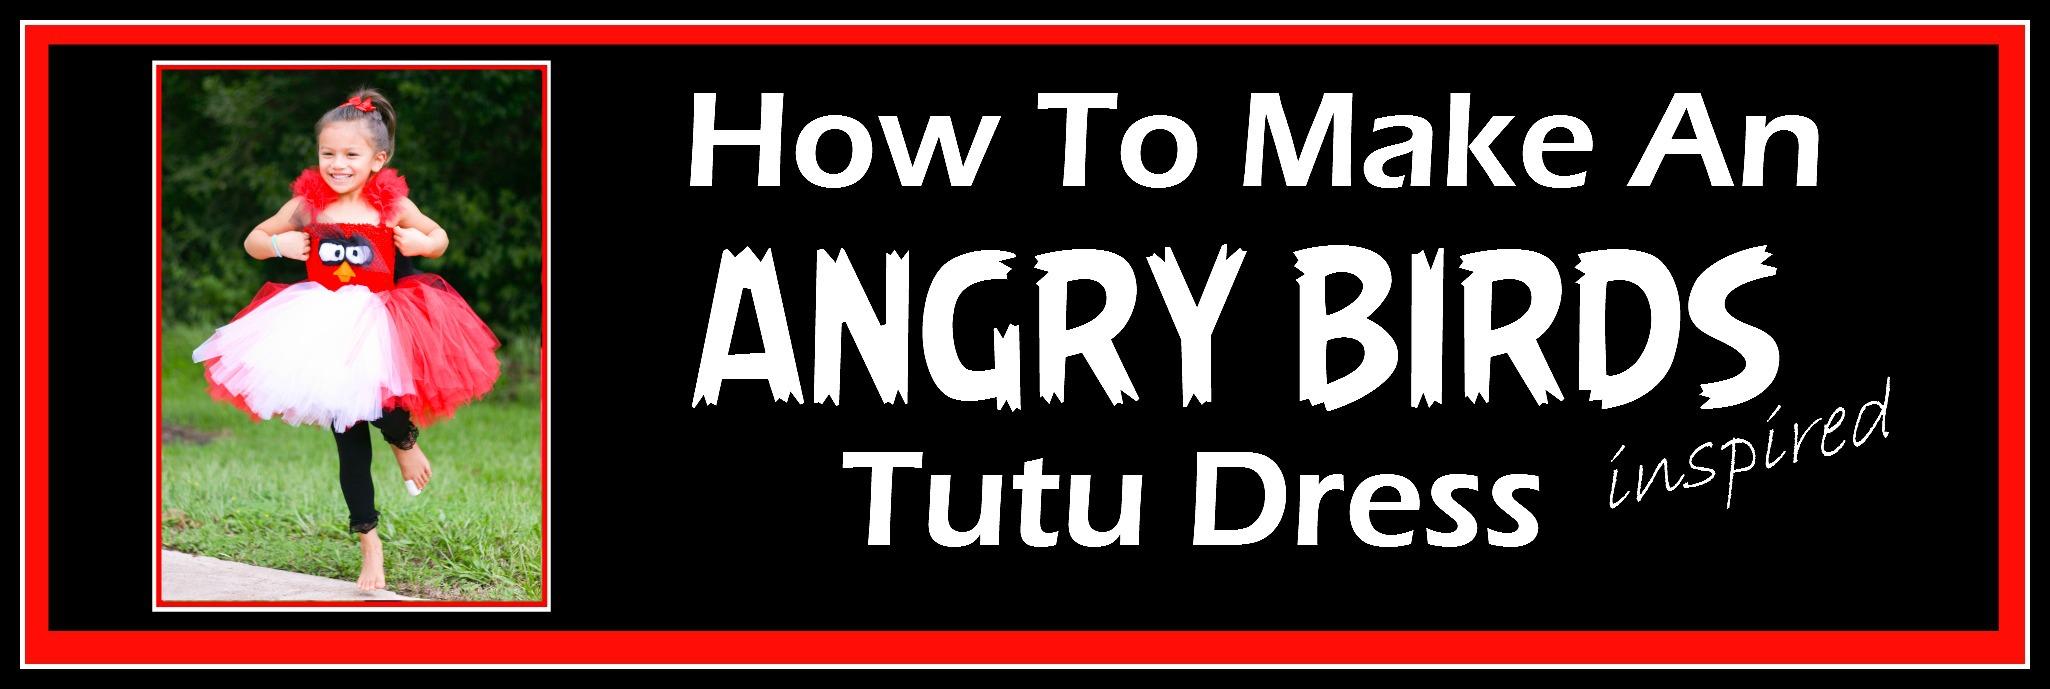 Red angry bird tutu dress tutorial   how to make a fluffy short.